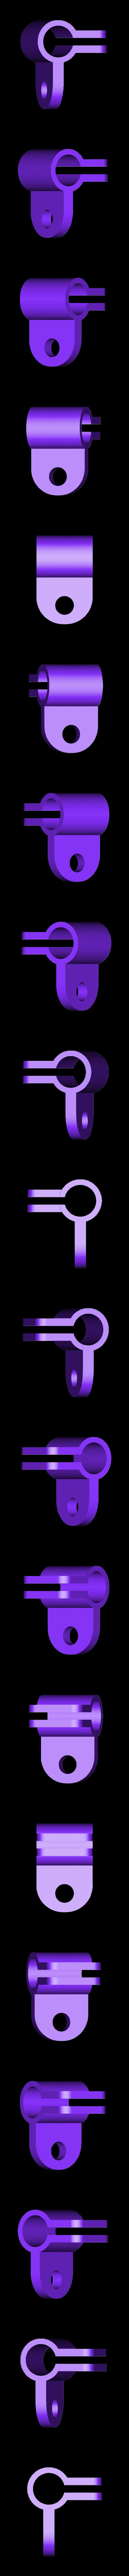 Endoscope_Holder_for_Saddle_v1.stl Télécharger fichier STL gratuit Support et selle d'endoscope • Design imprimable en 3D, iamsanman